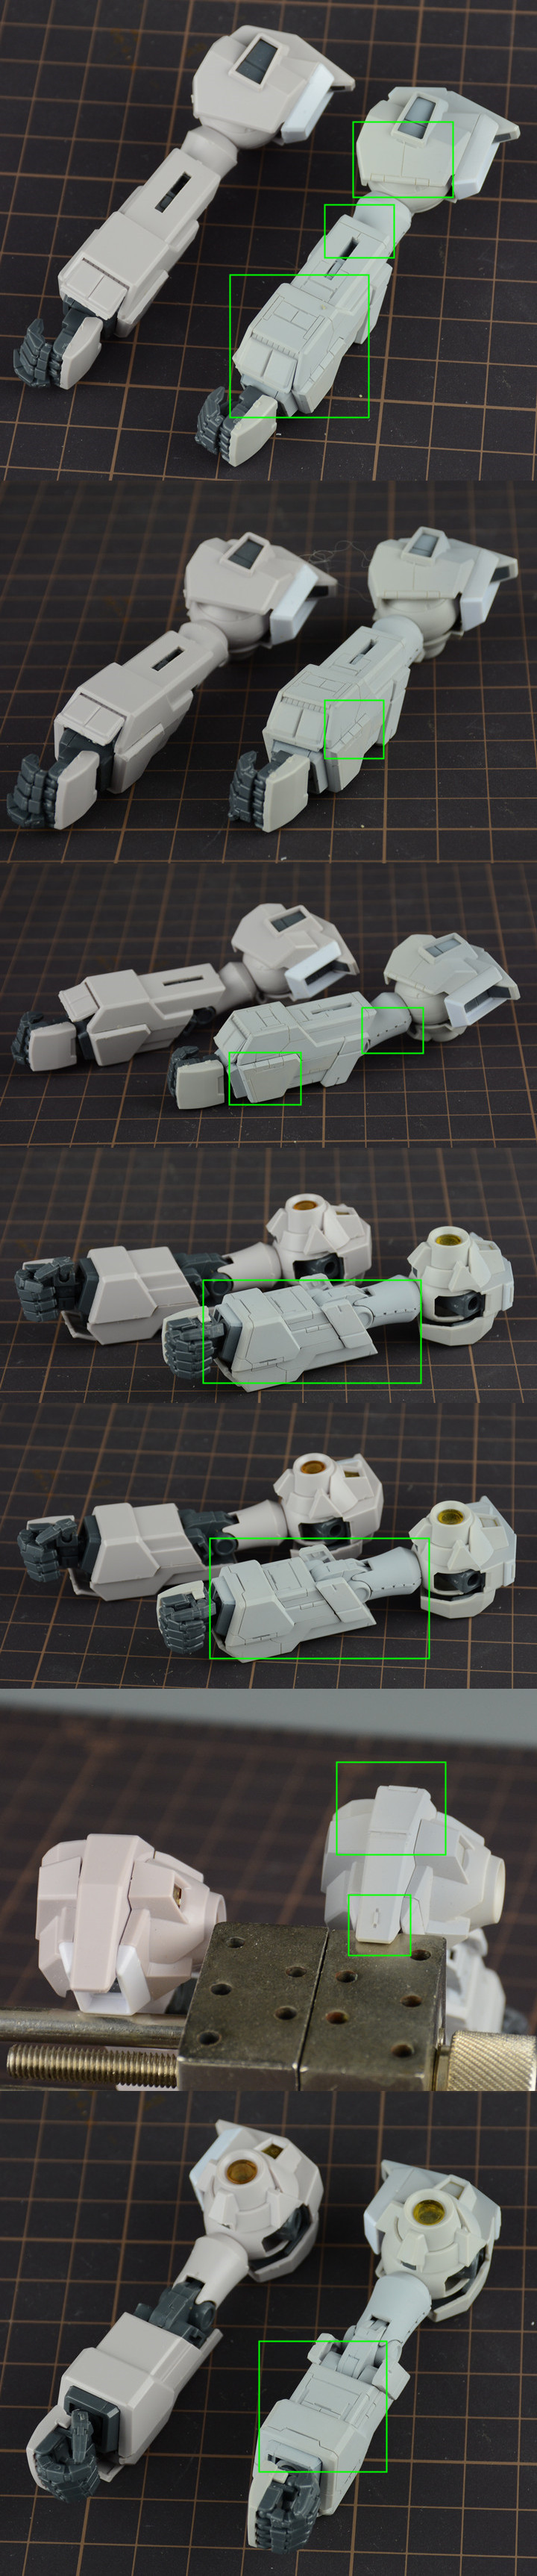 G131_SIDE3_MG_RGZ_95C_019.jpg